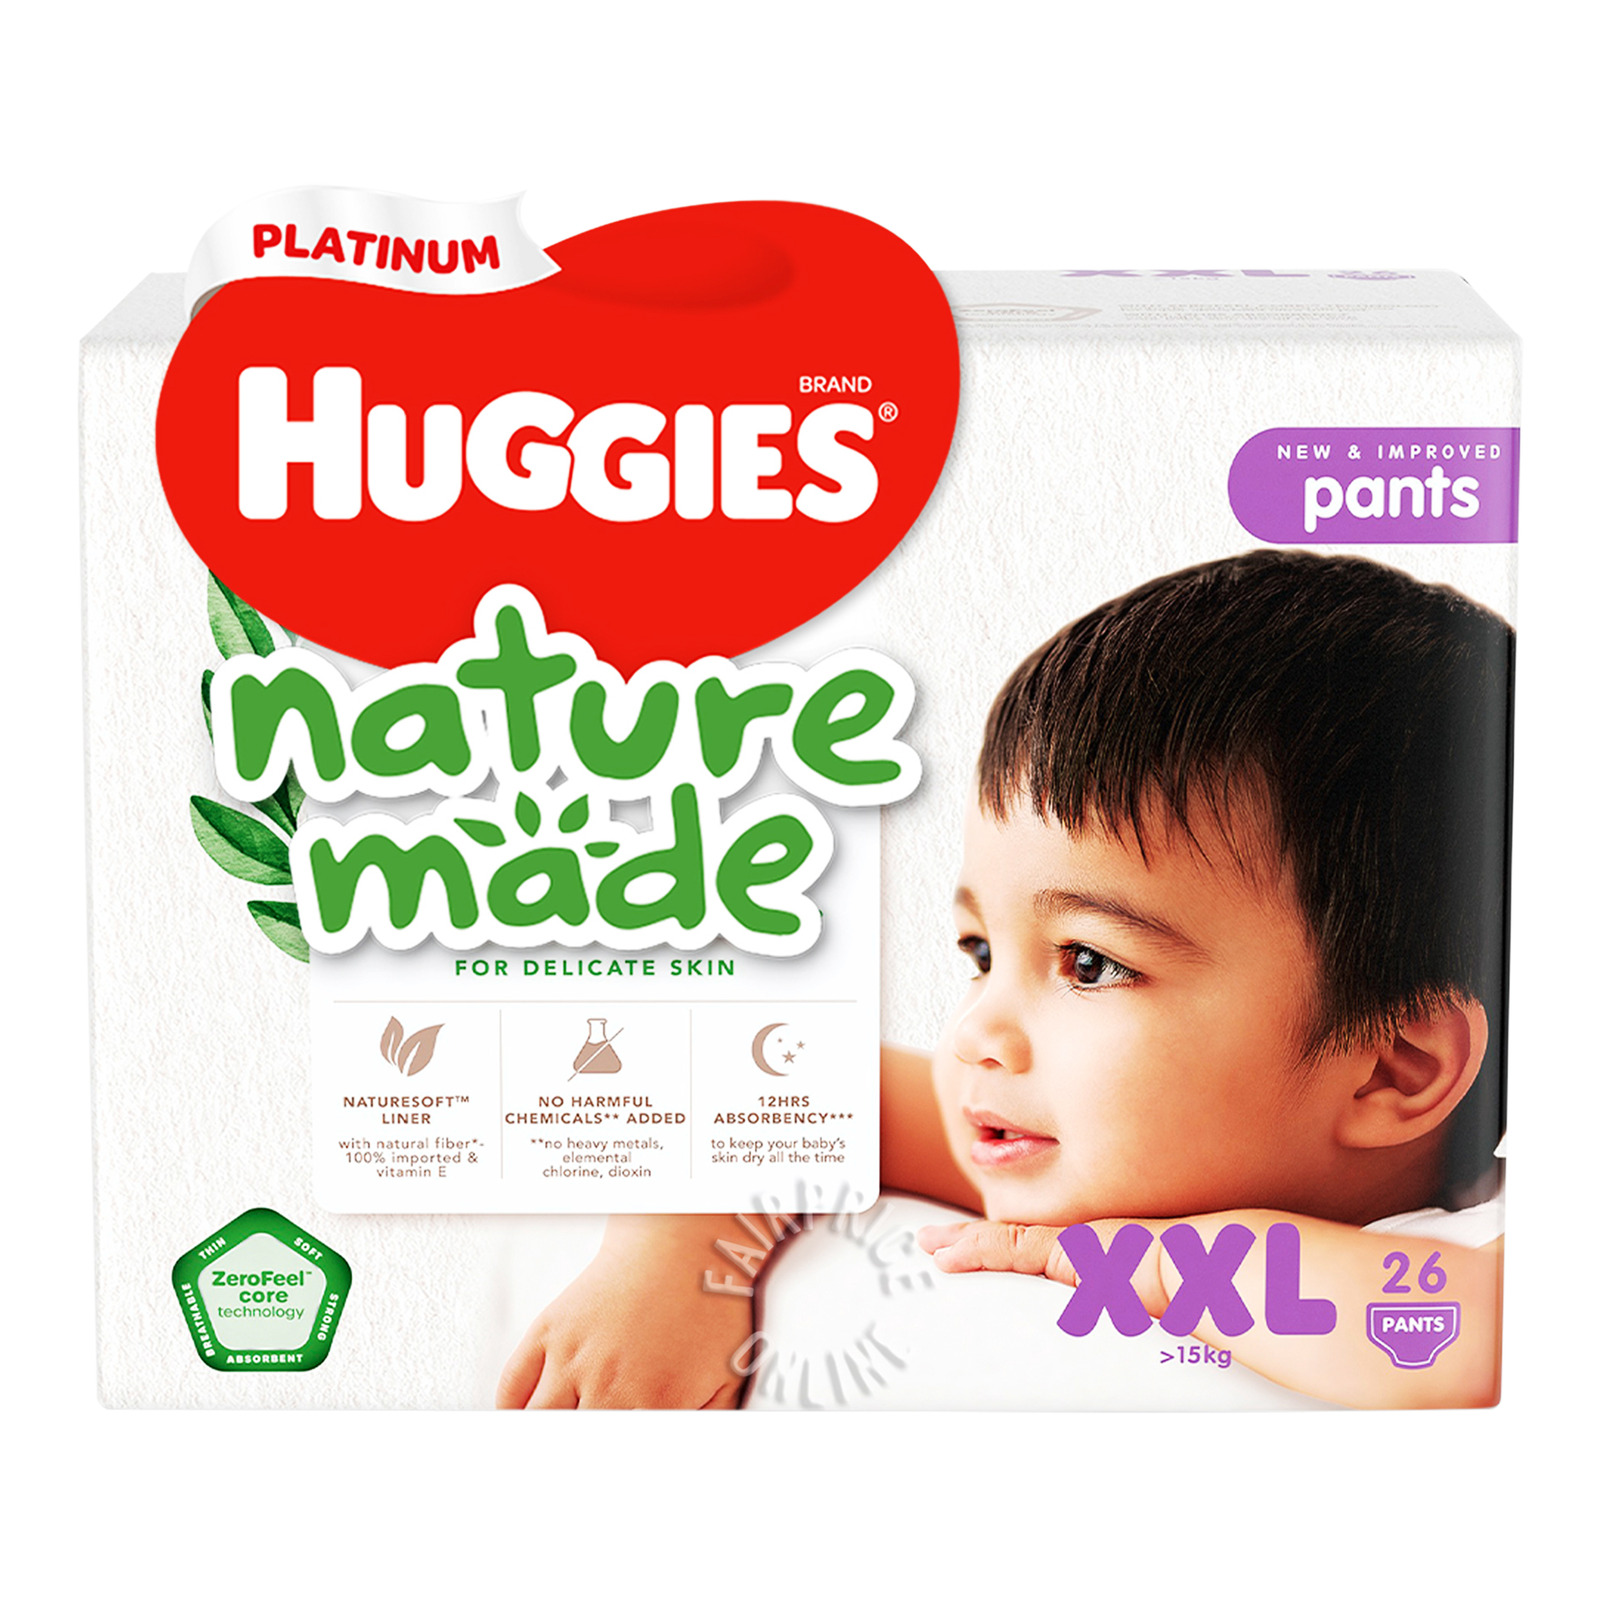 Huggies Platinum Nature Made Pants - XXL ( >15kg)